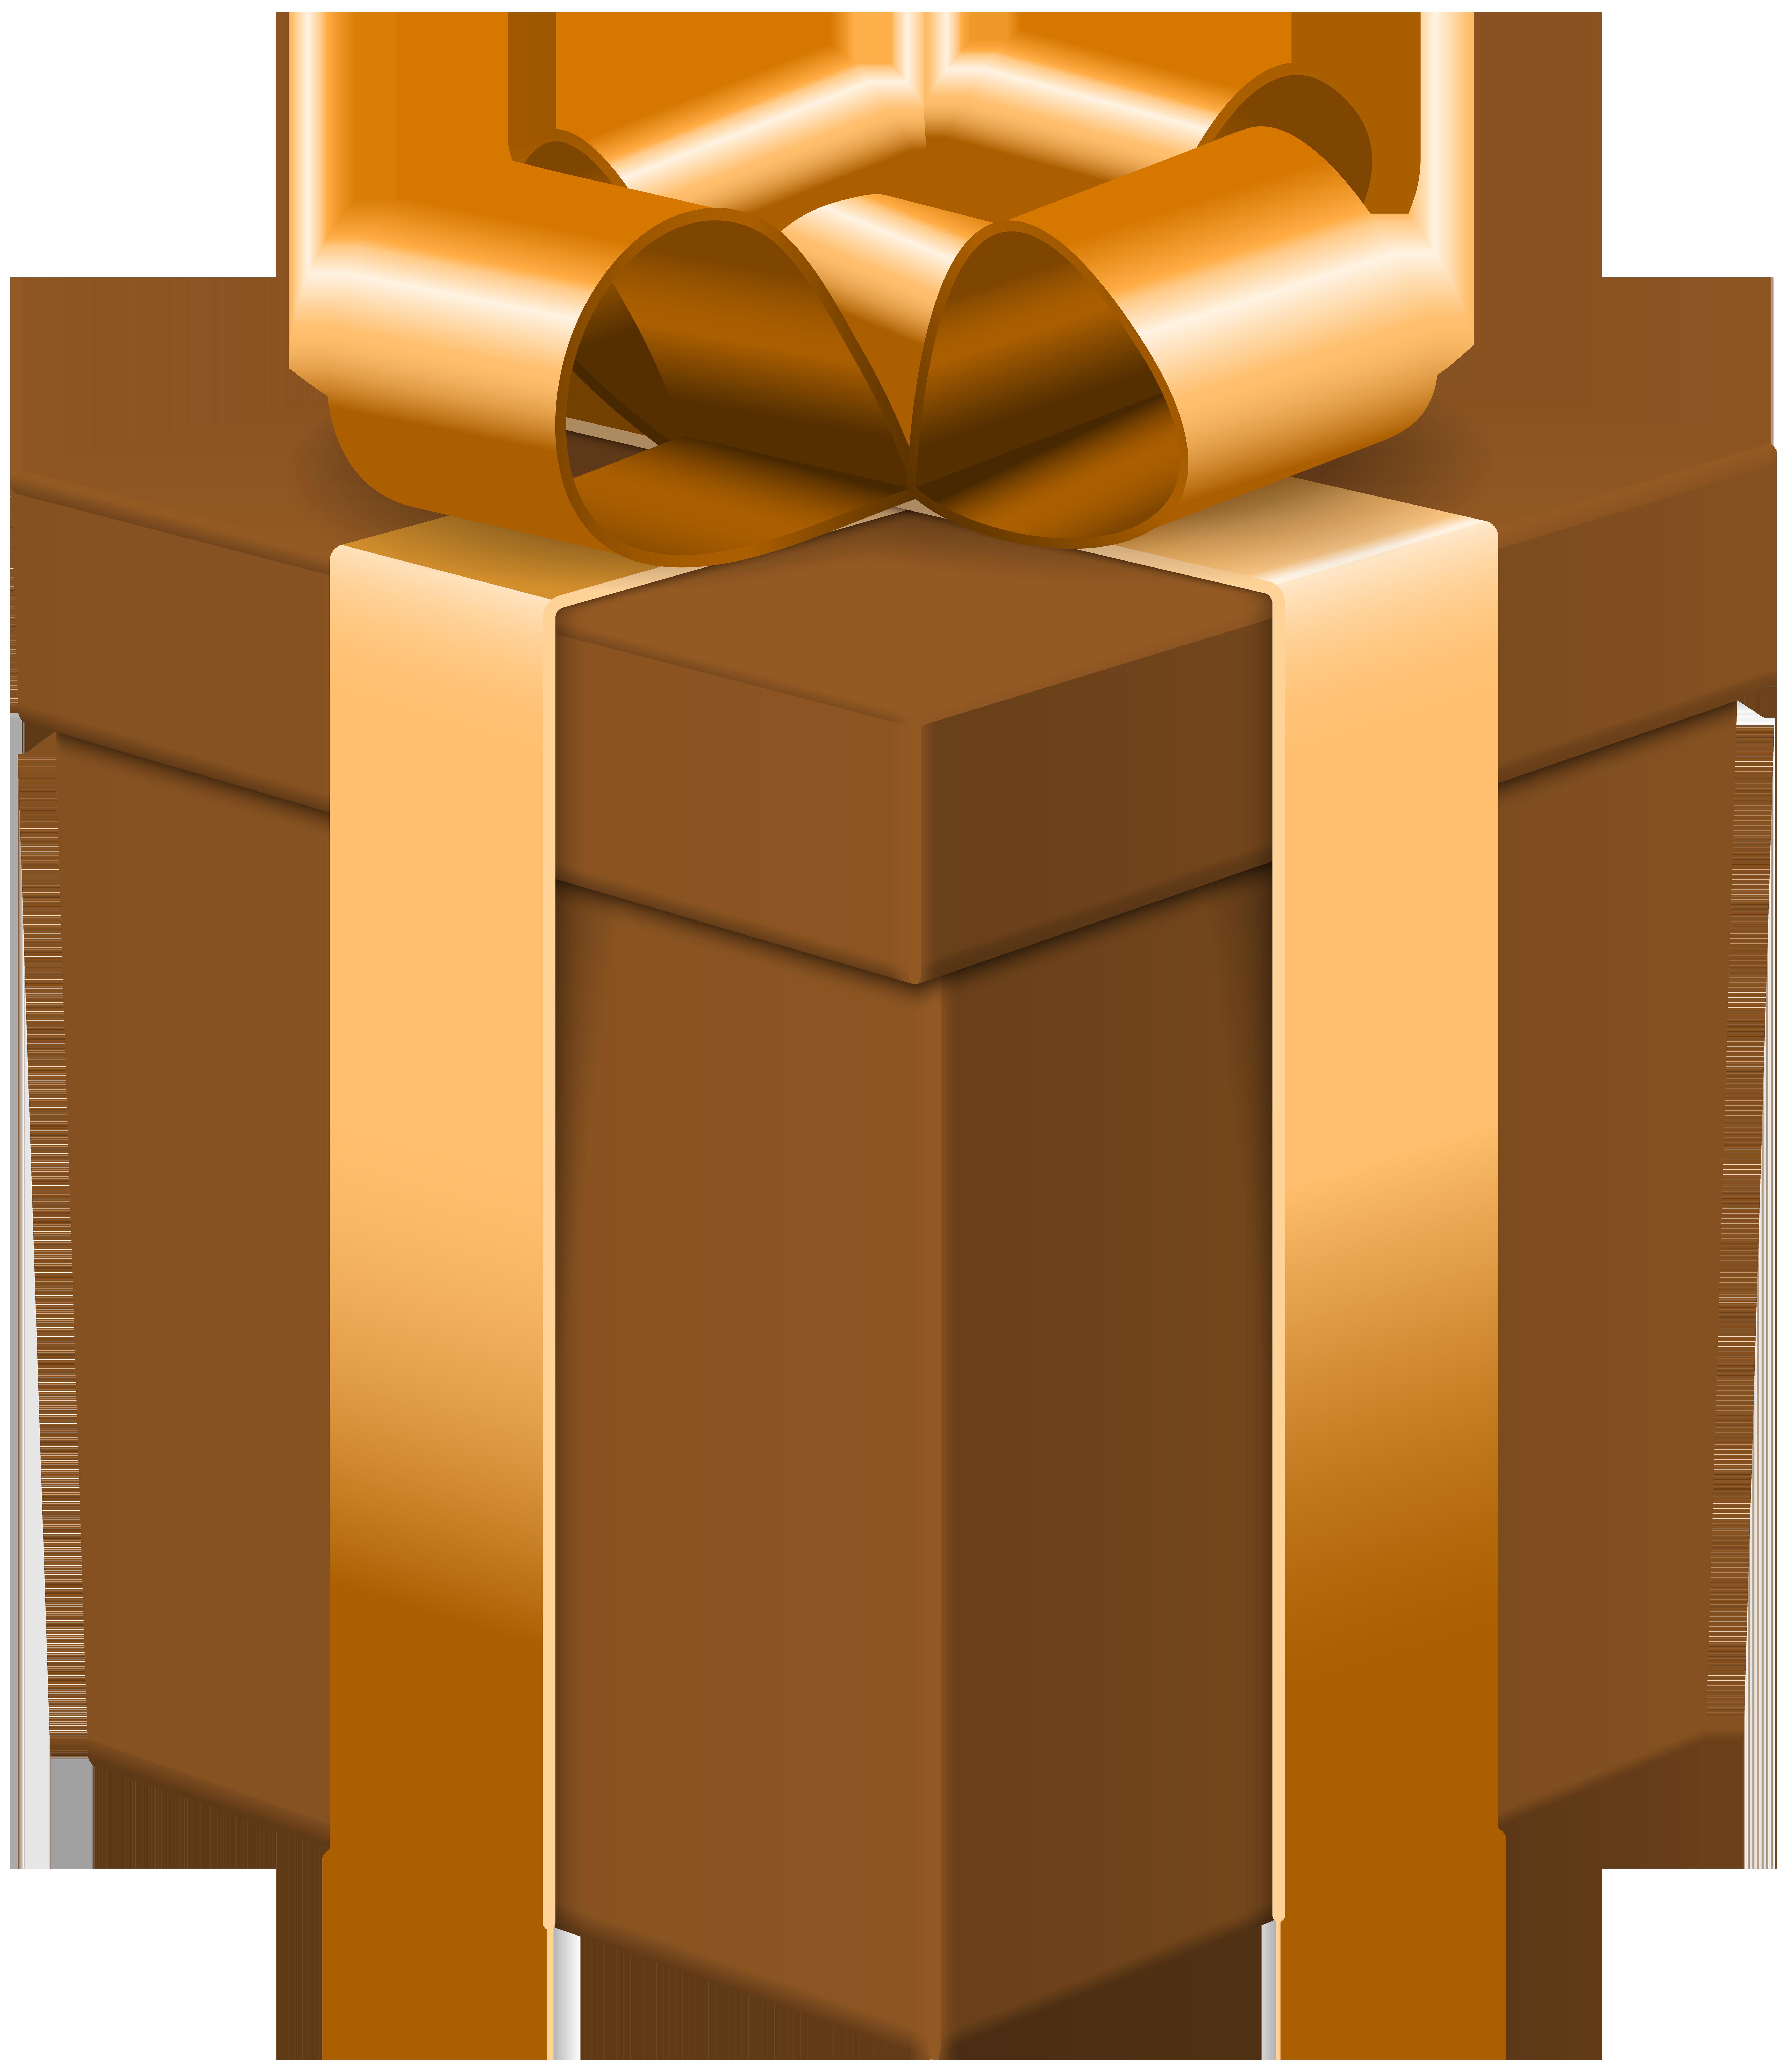 Gift Box Brown Transparent Clip Art Image.